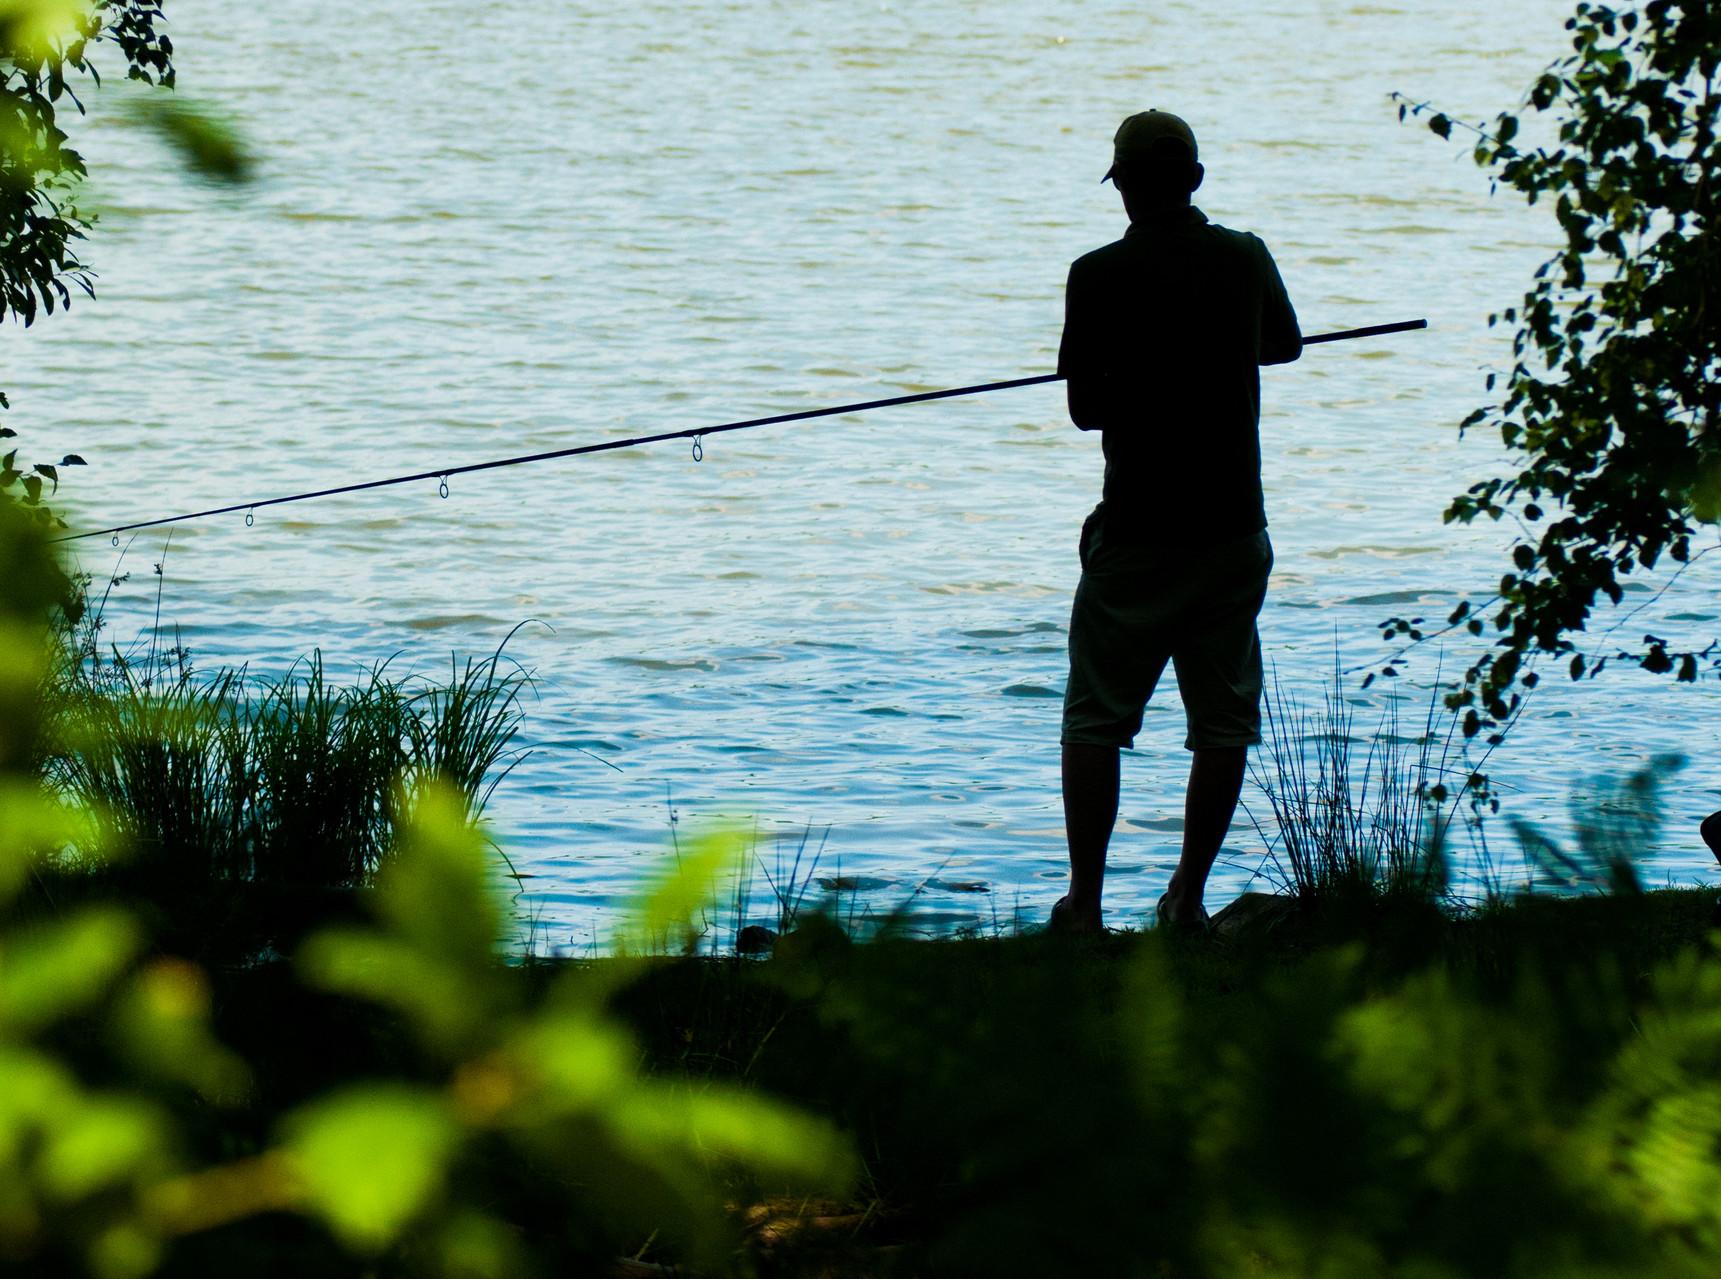 Pêche à Sillé Plage © Stevan Lira